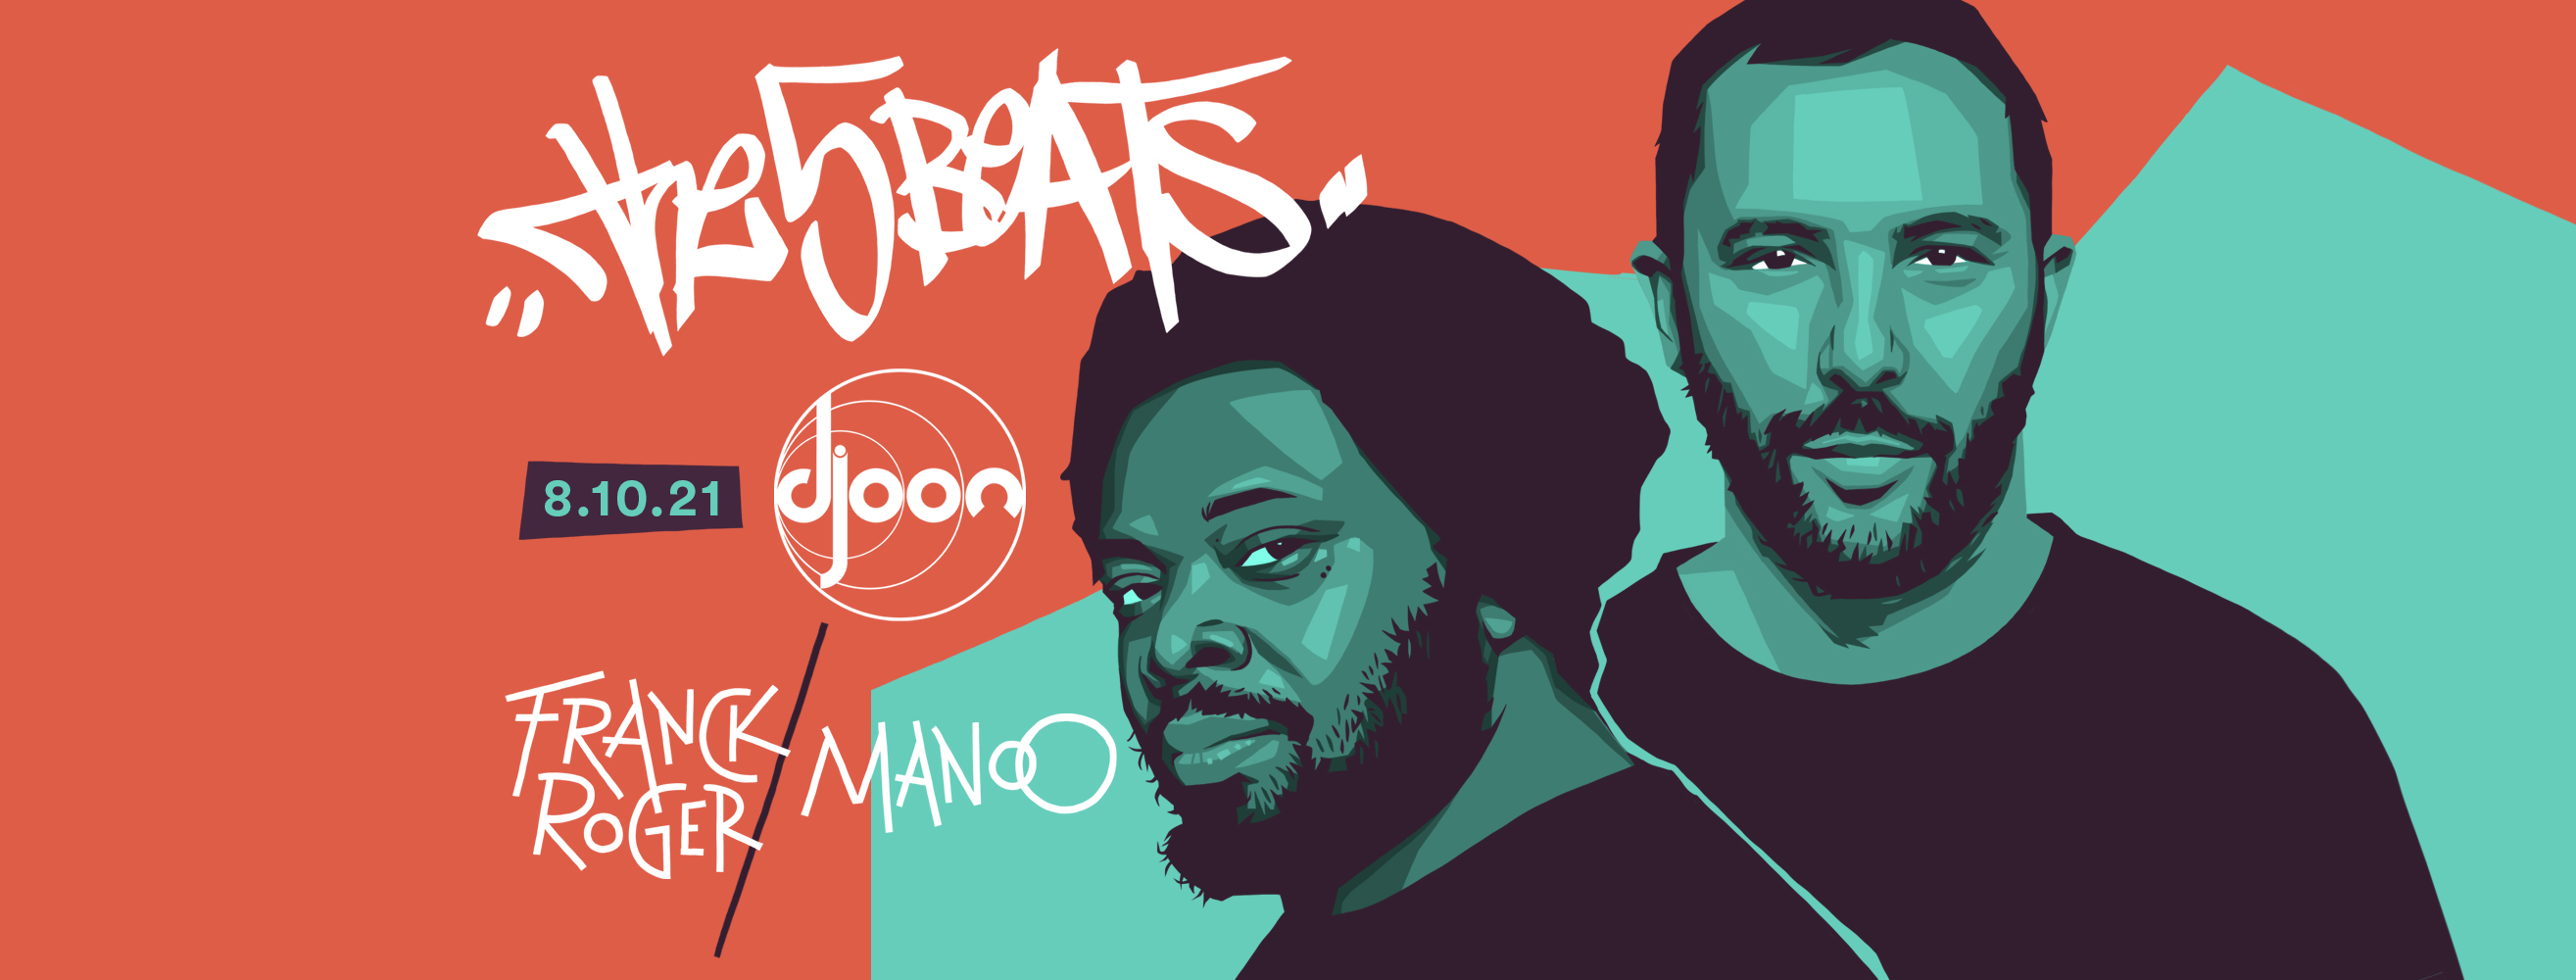 Djoon: The 5 Beats w/ Franck Roger & Manoo